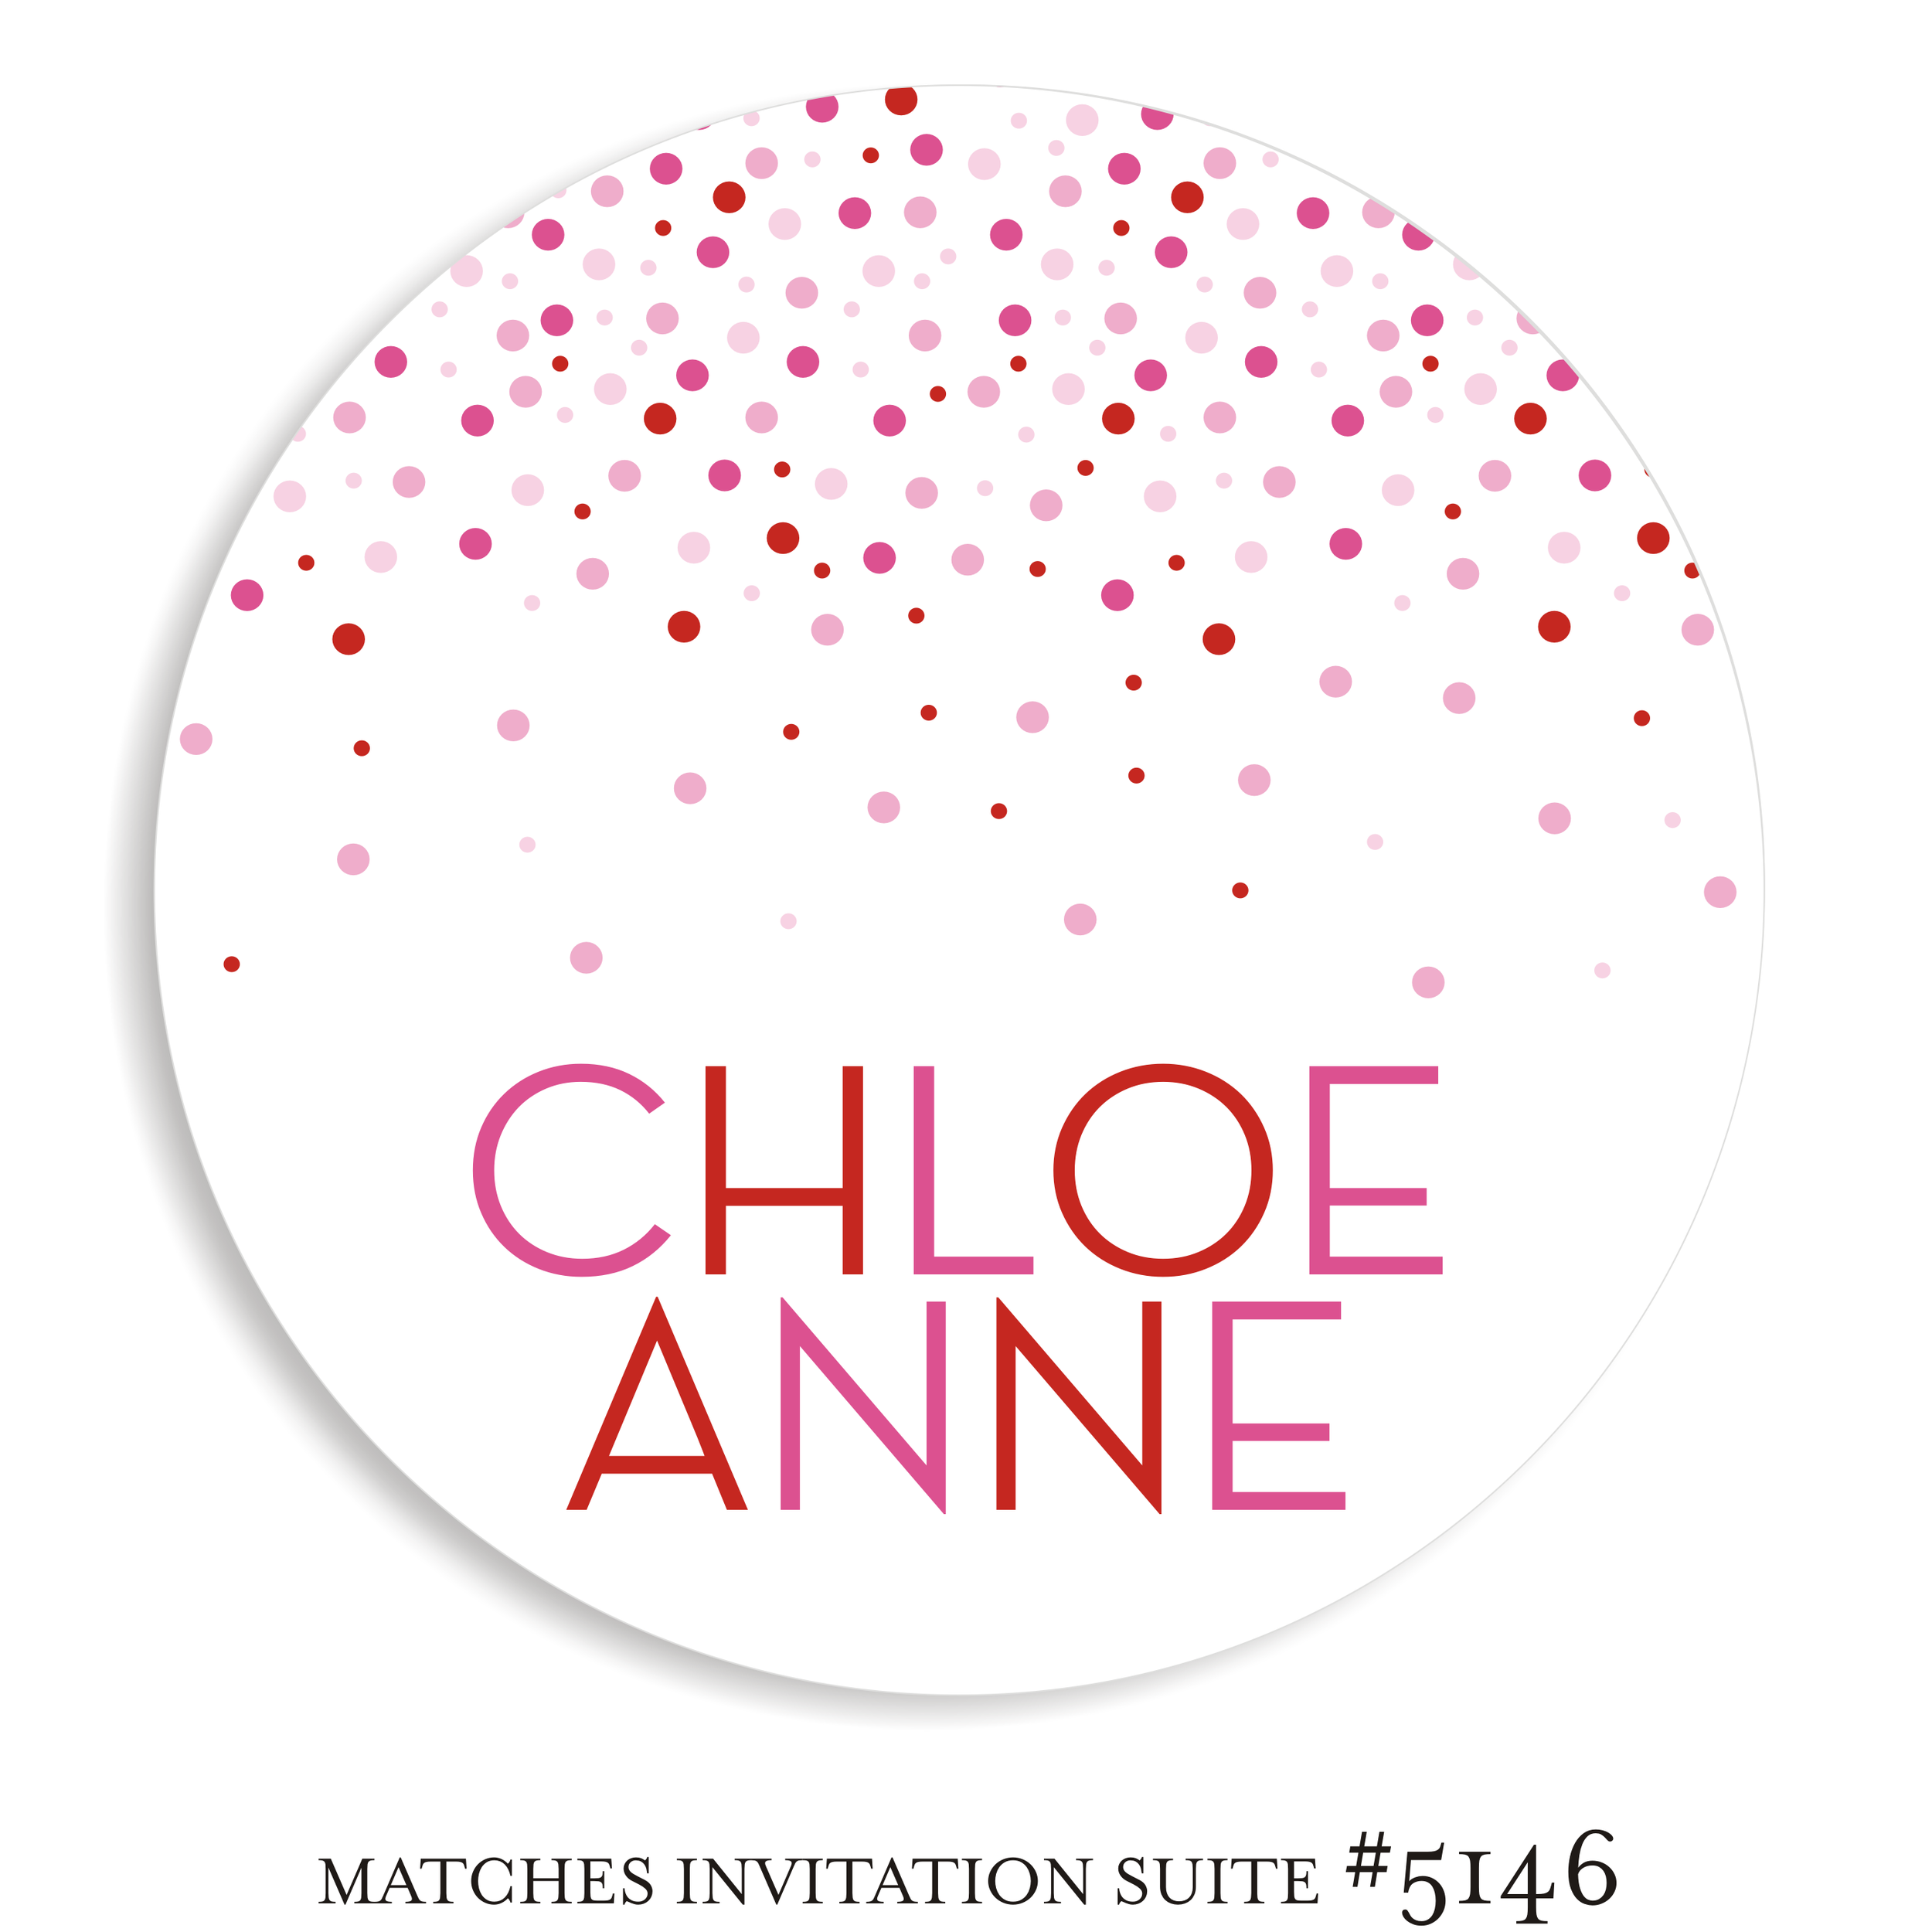 Dancefloor Decal Bat Mitzvah Suite 5146 - Chloe Anne